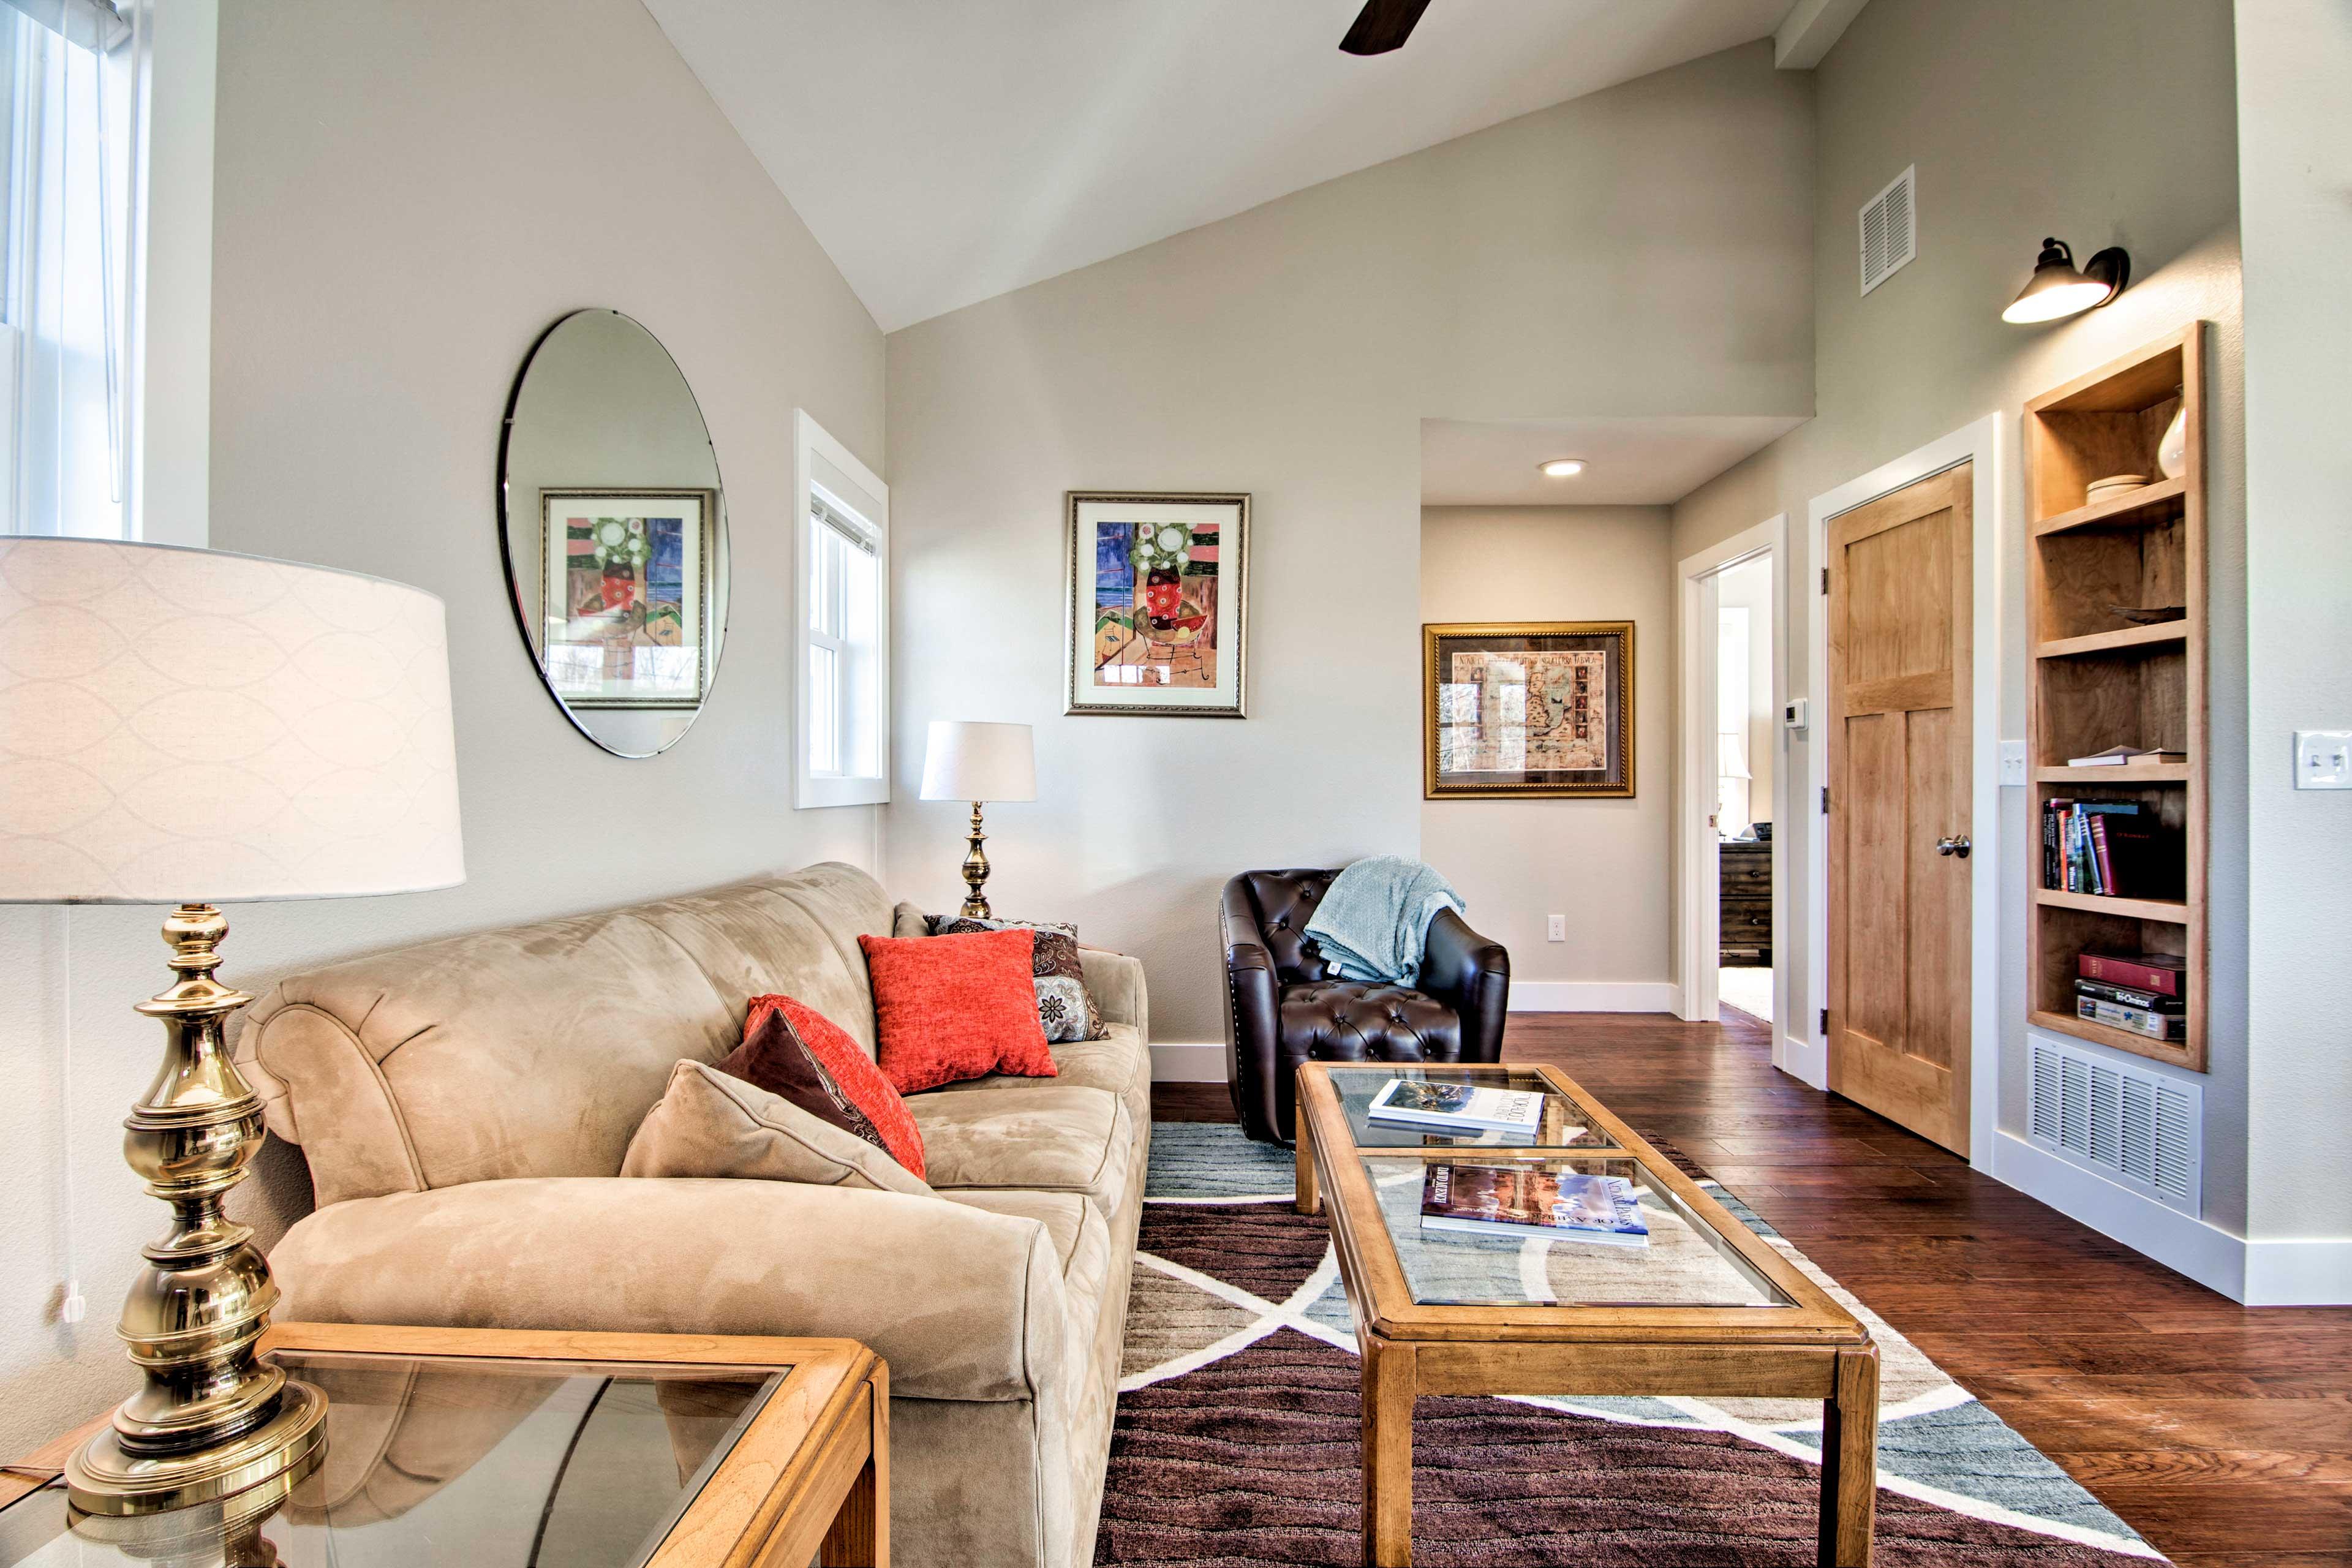 Cozy furnishings adorn the interior.